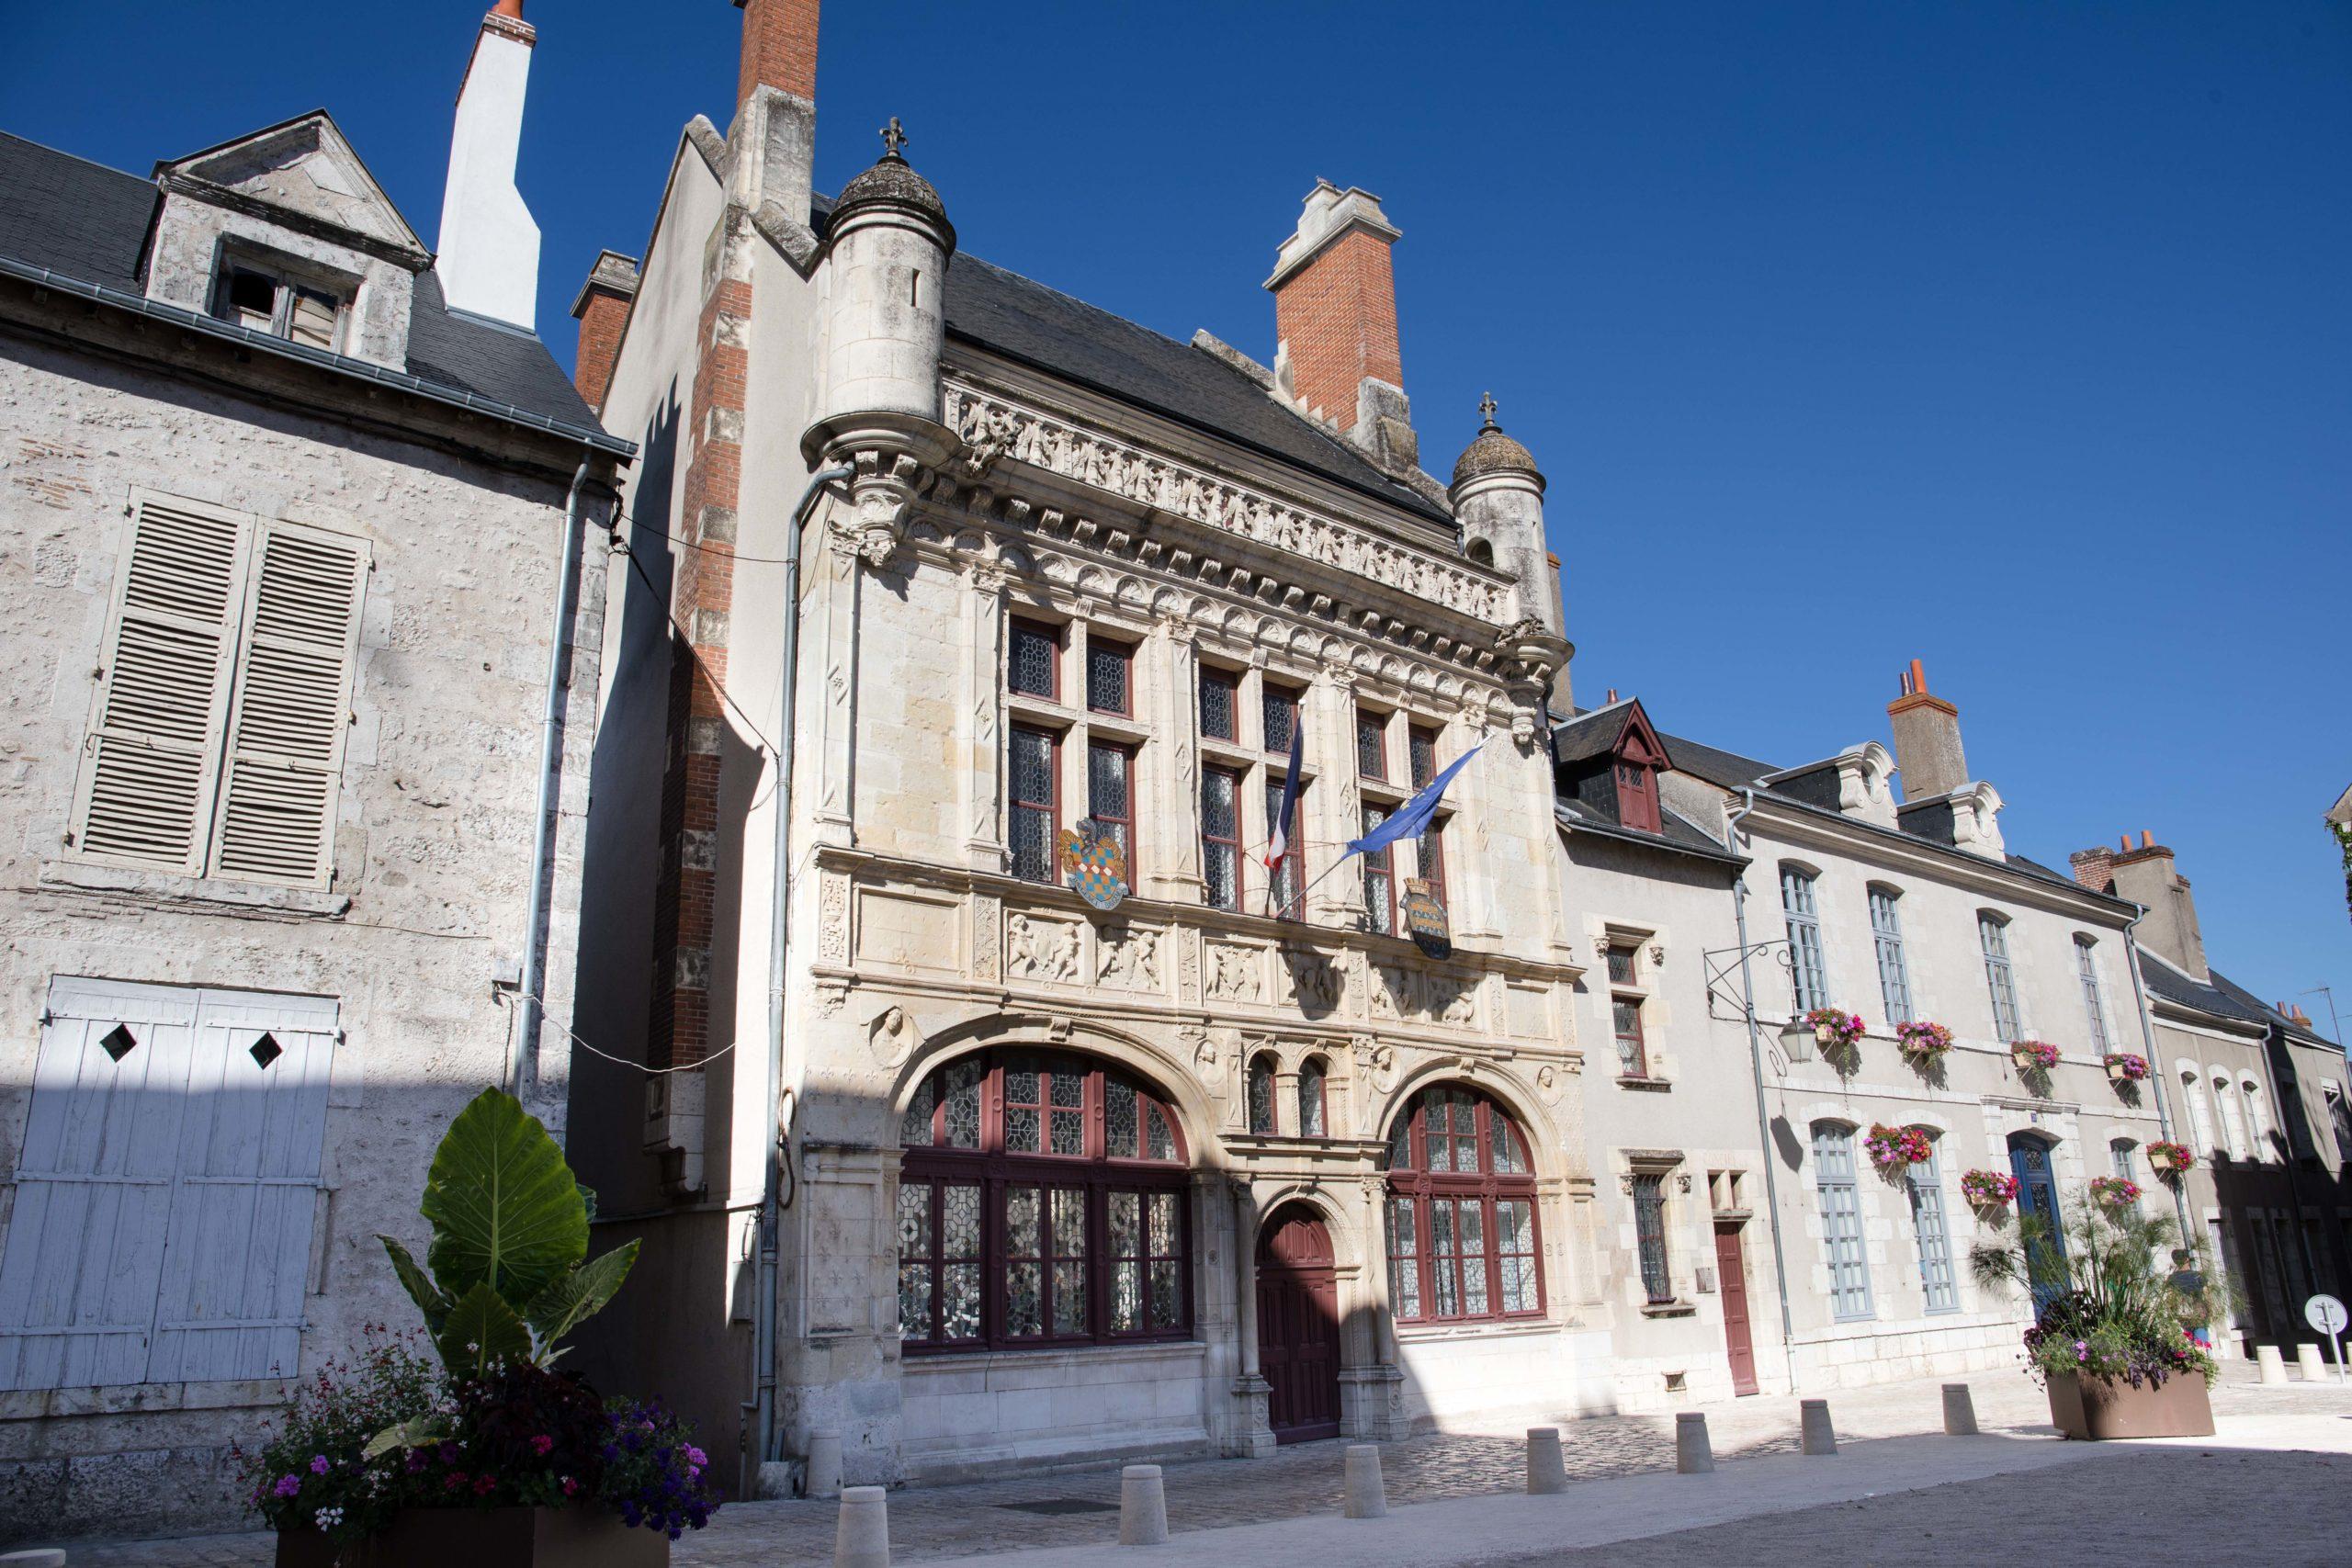 Hôtel de ville de Beaugency Beaugency